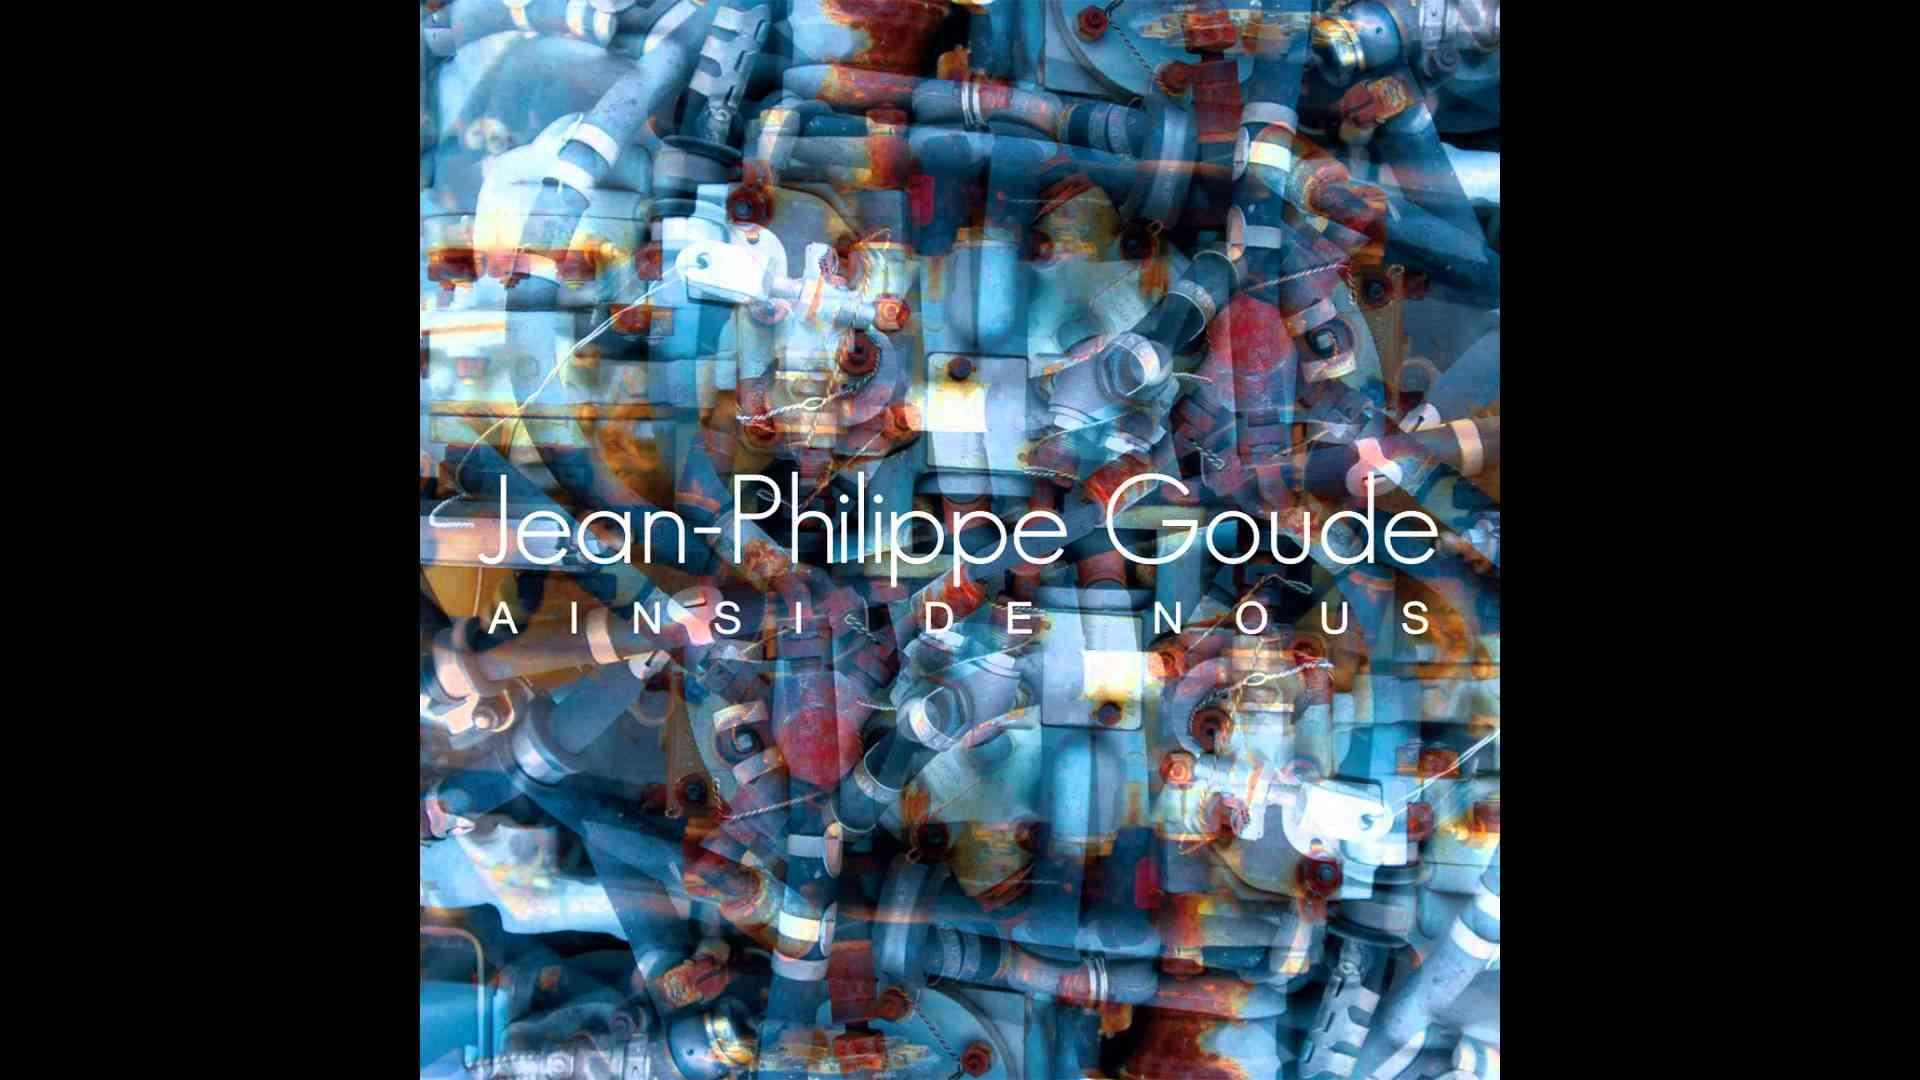 Jean-Philippe Goude - Sic Transit Gloria Mundi - YouTube